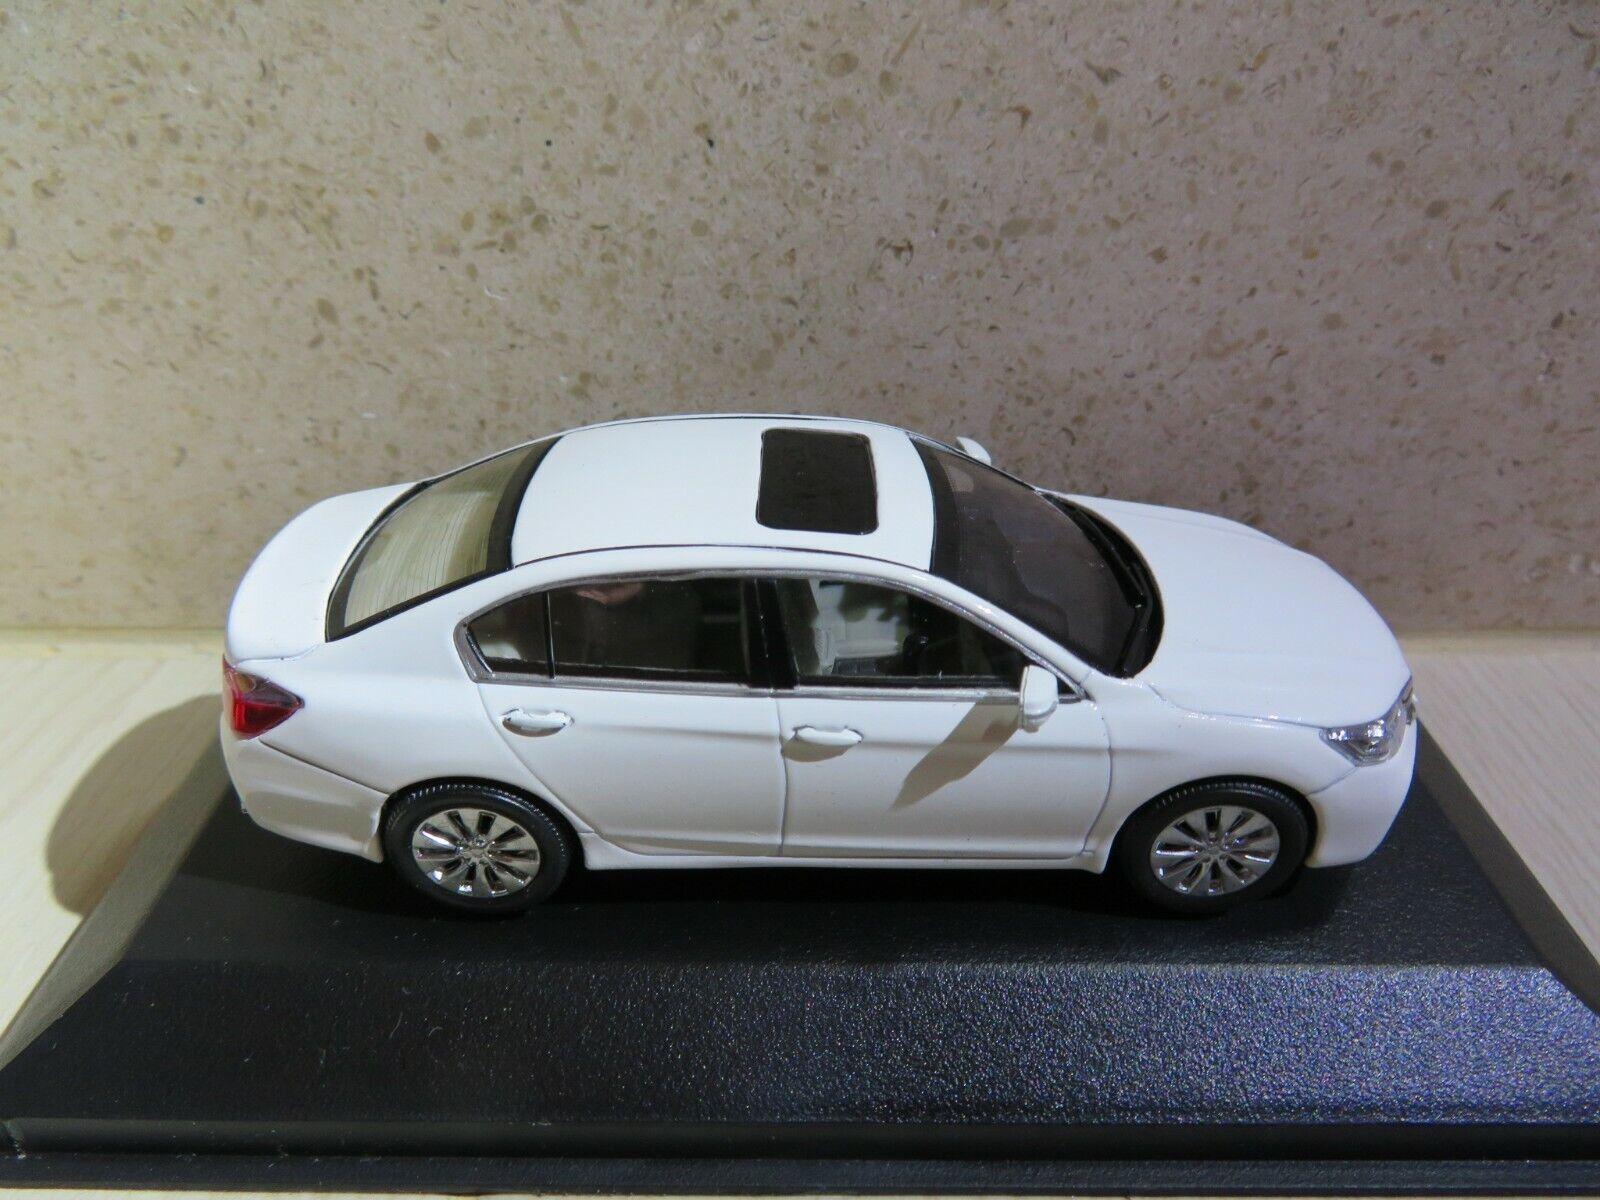 1:43 2017 HONDA ACCORD SEDAN DARK BLUE LHD DIECAST CARS DEALER BOX